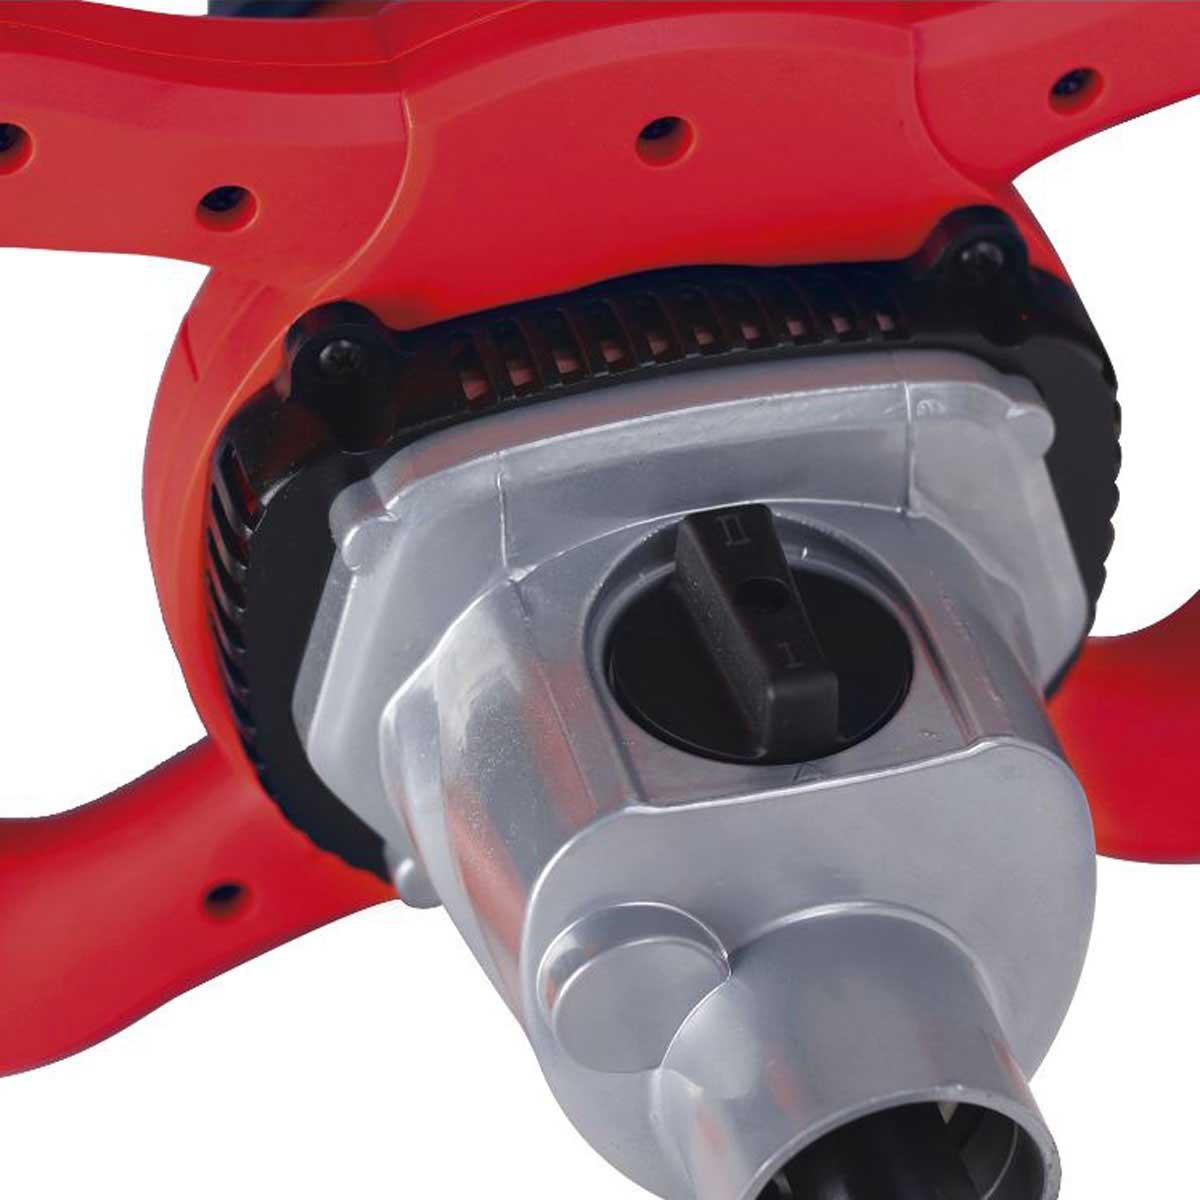 Rubimix 9-N two speed mortar Mixer